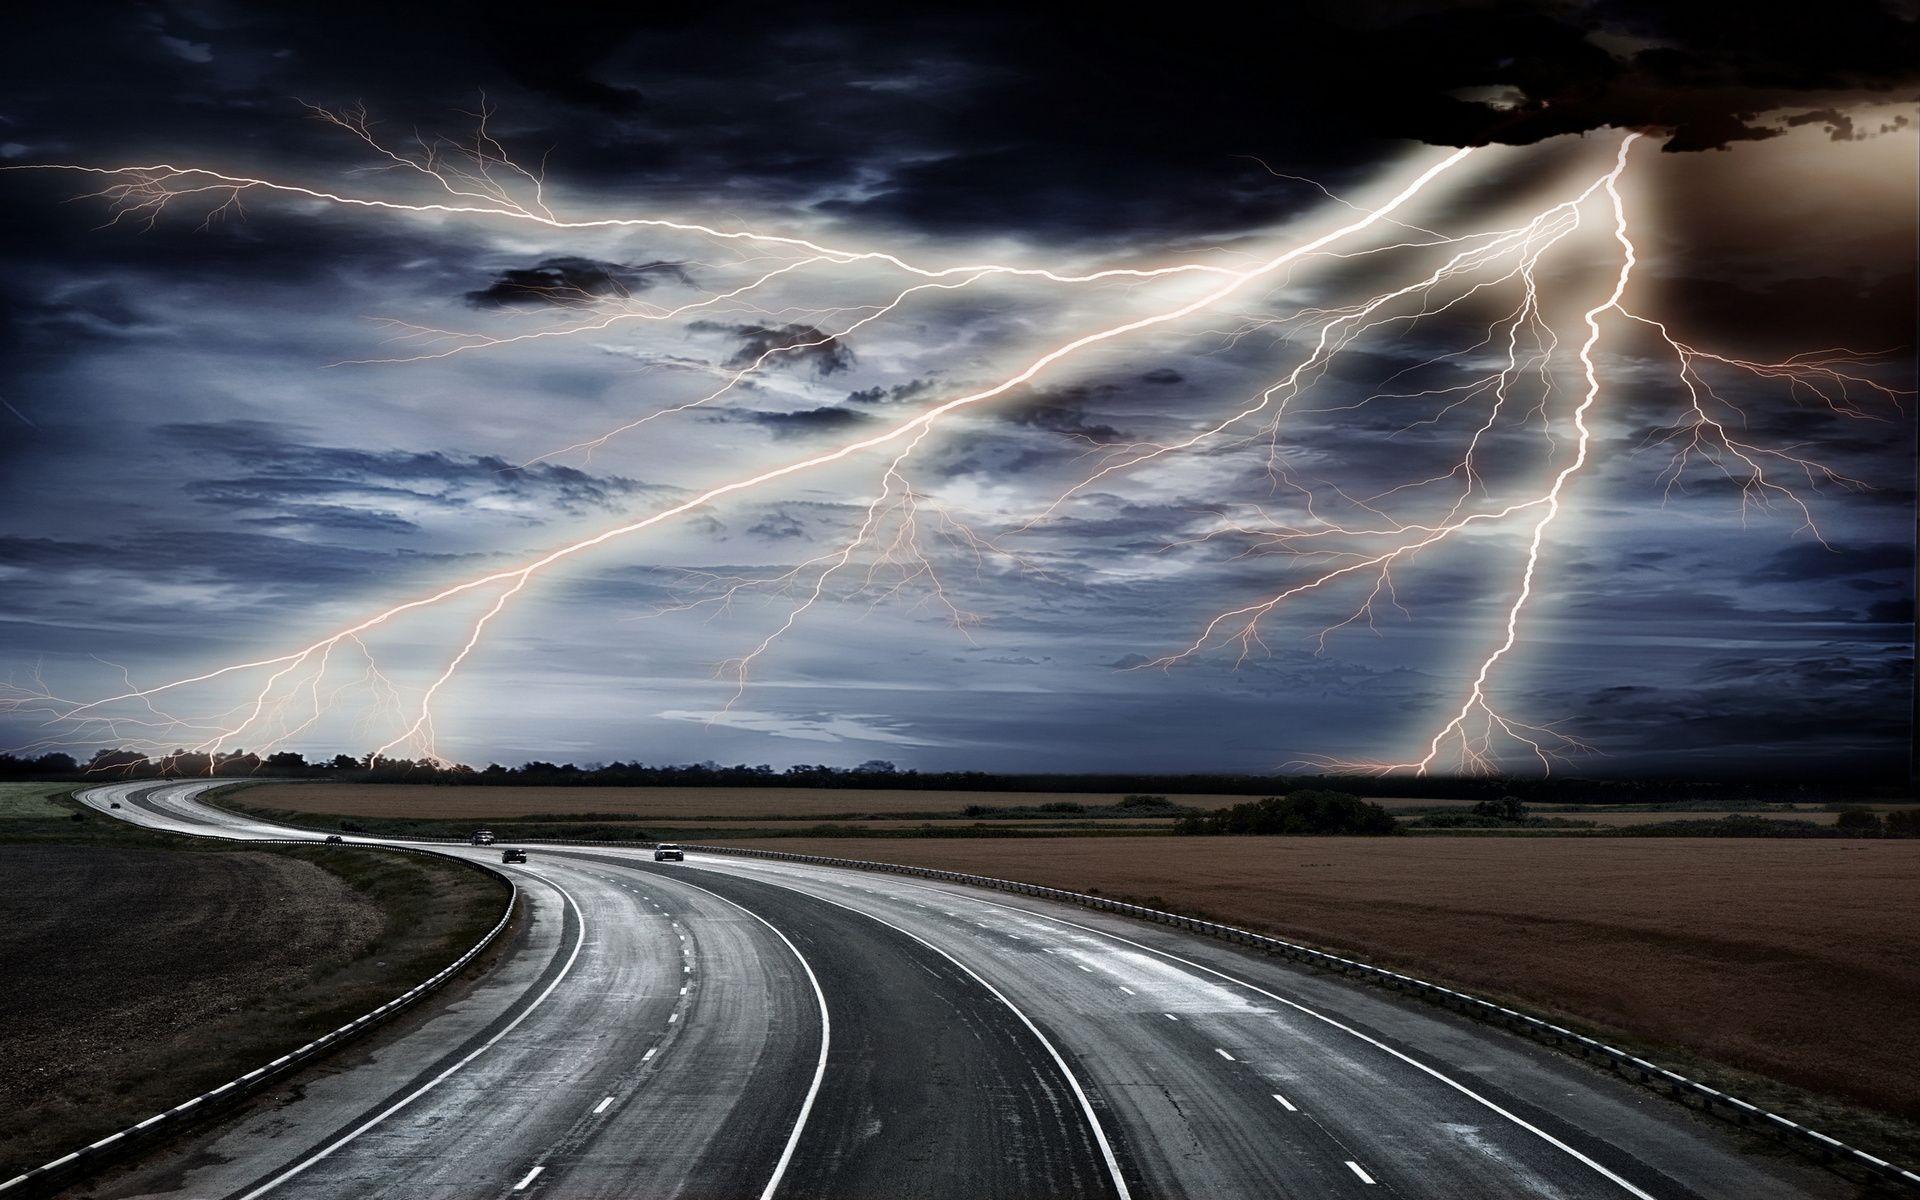 Lightning Storm Wallpapers Wallpaper | HD Wallpapers | Pinterest |  Lightning and Wallpaper